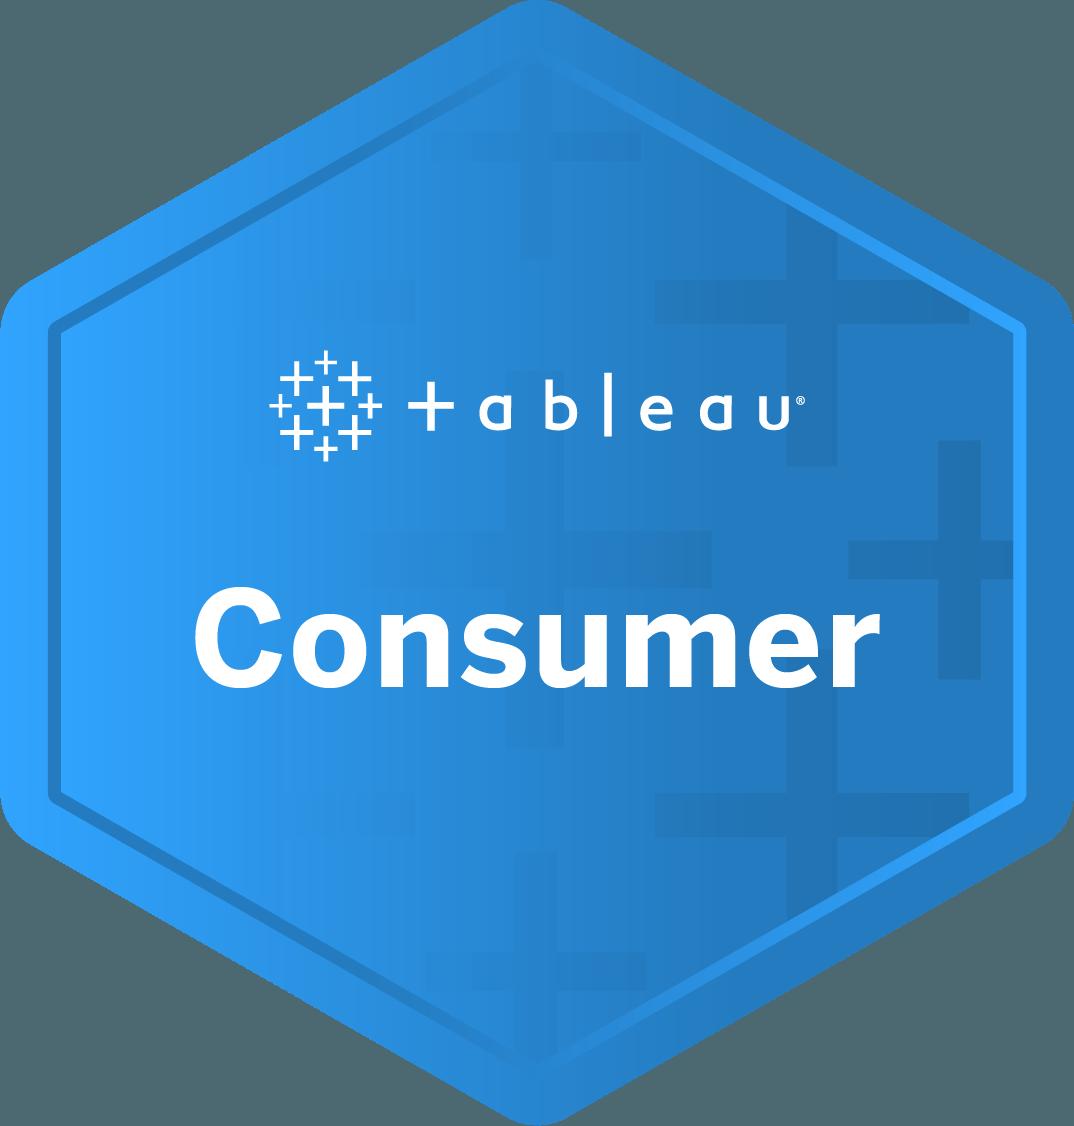 Consumer badge